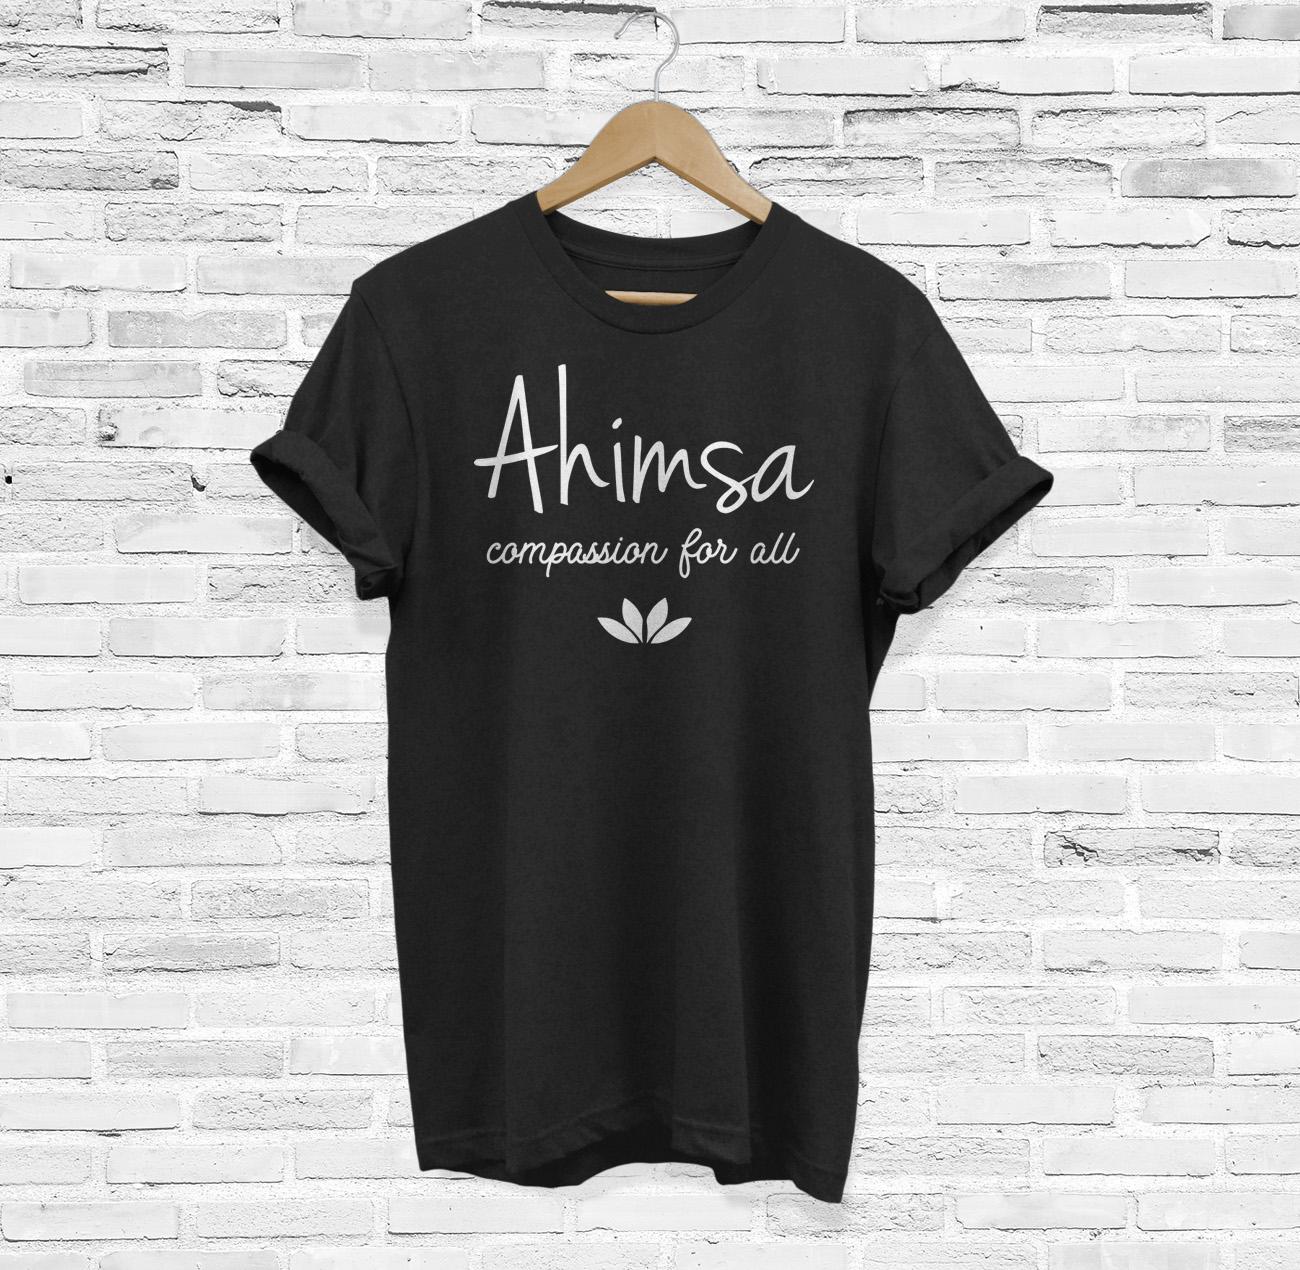 Ahimsa Vegan Compassion for All T-Shirt